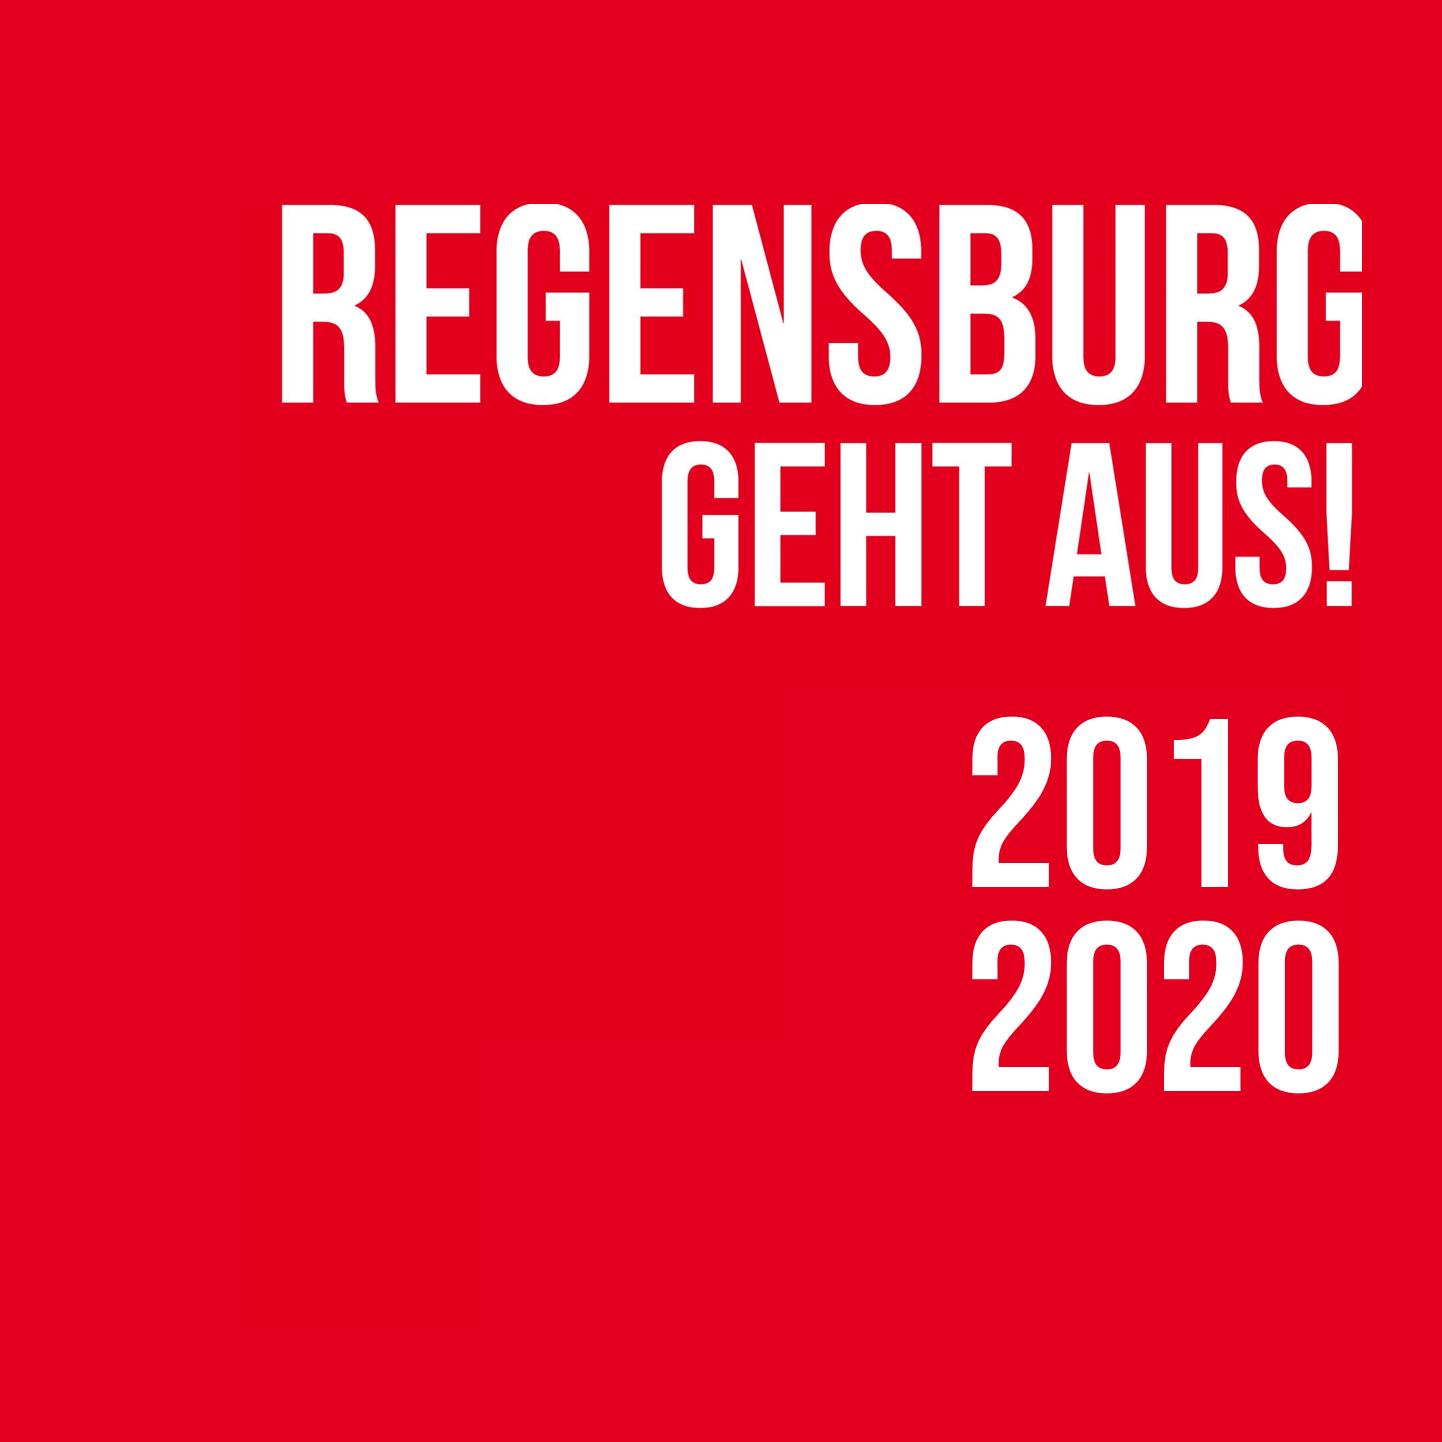 Regensburg geht aus!